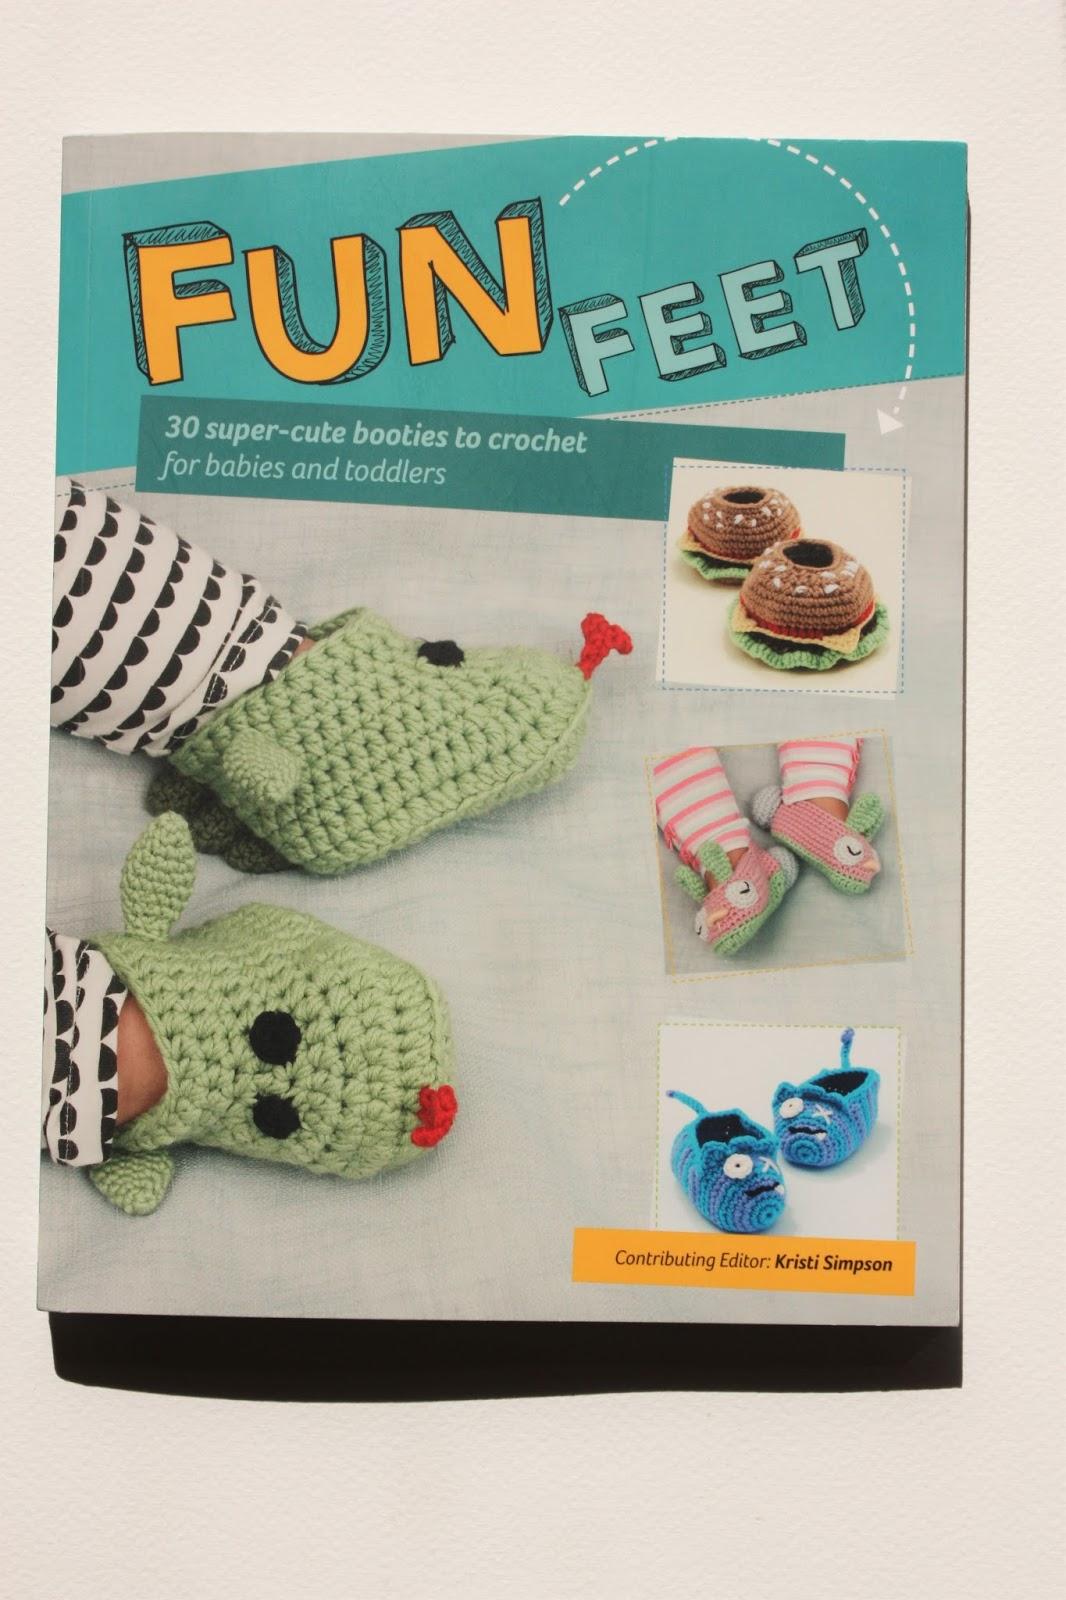 Happyamigurumi: Fun Feet, Creature Feetures - 30 Crochet Patterns ...